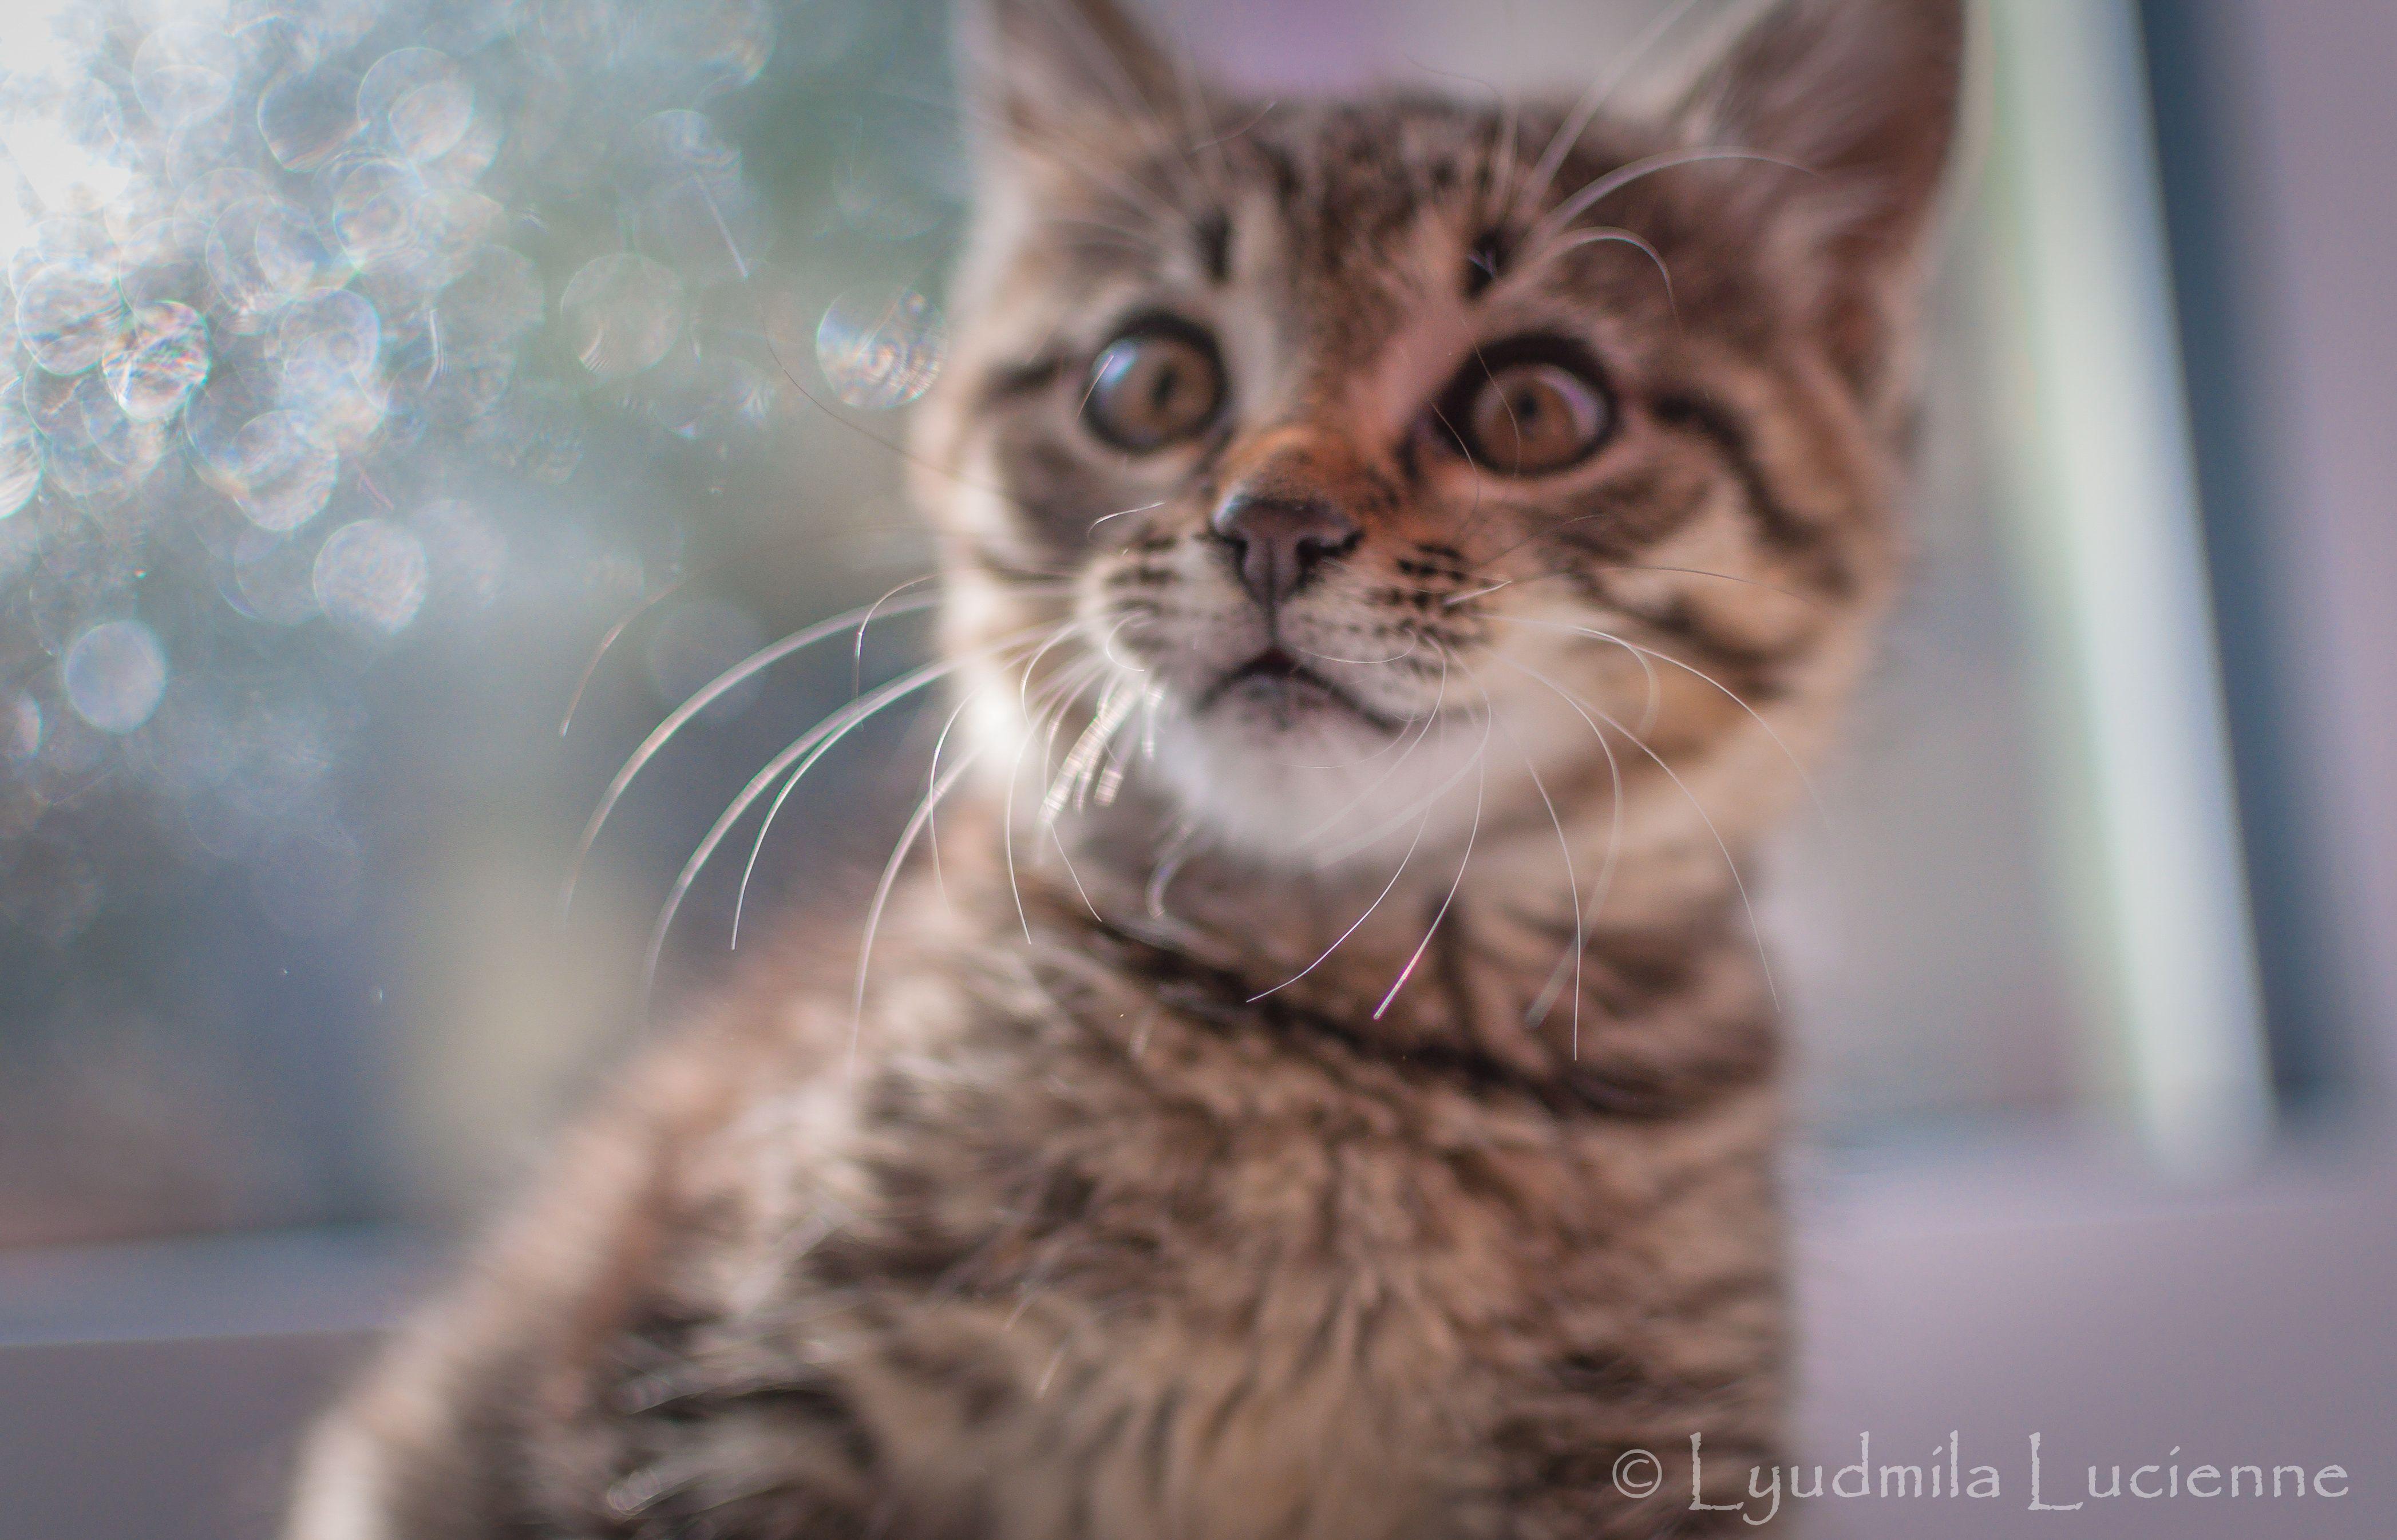 Ryska 's son. Син Риськи. originalcontent pet cat